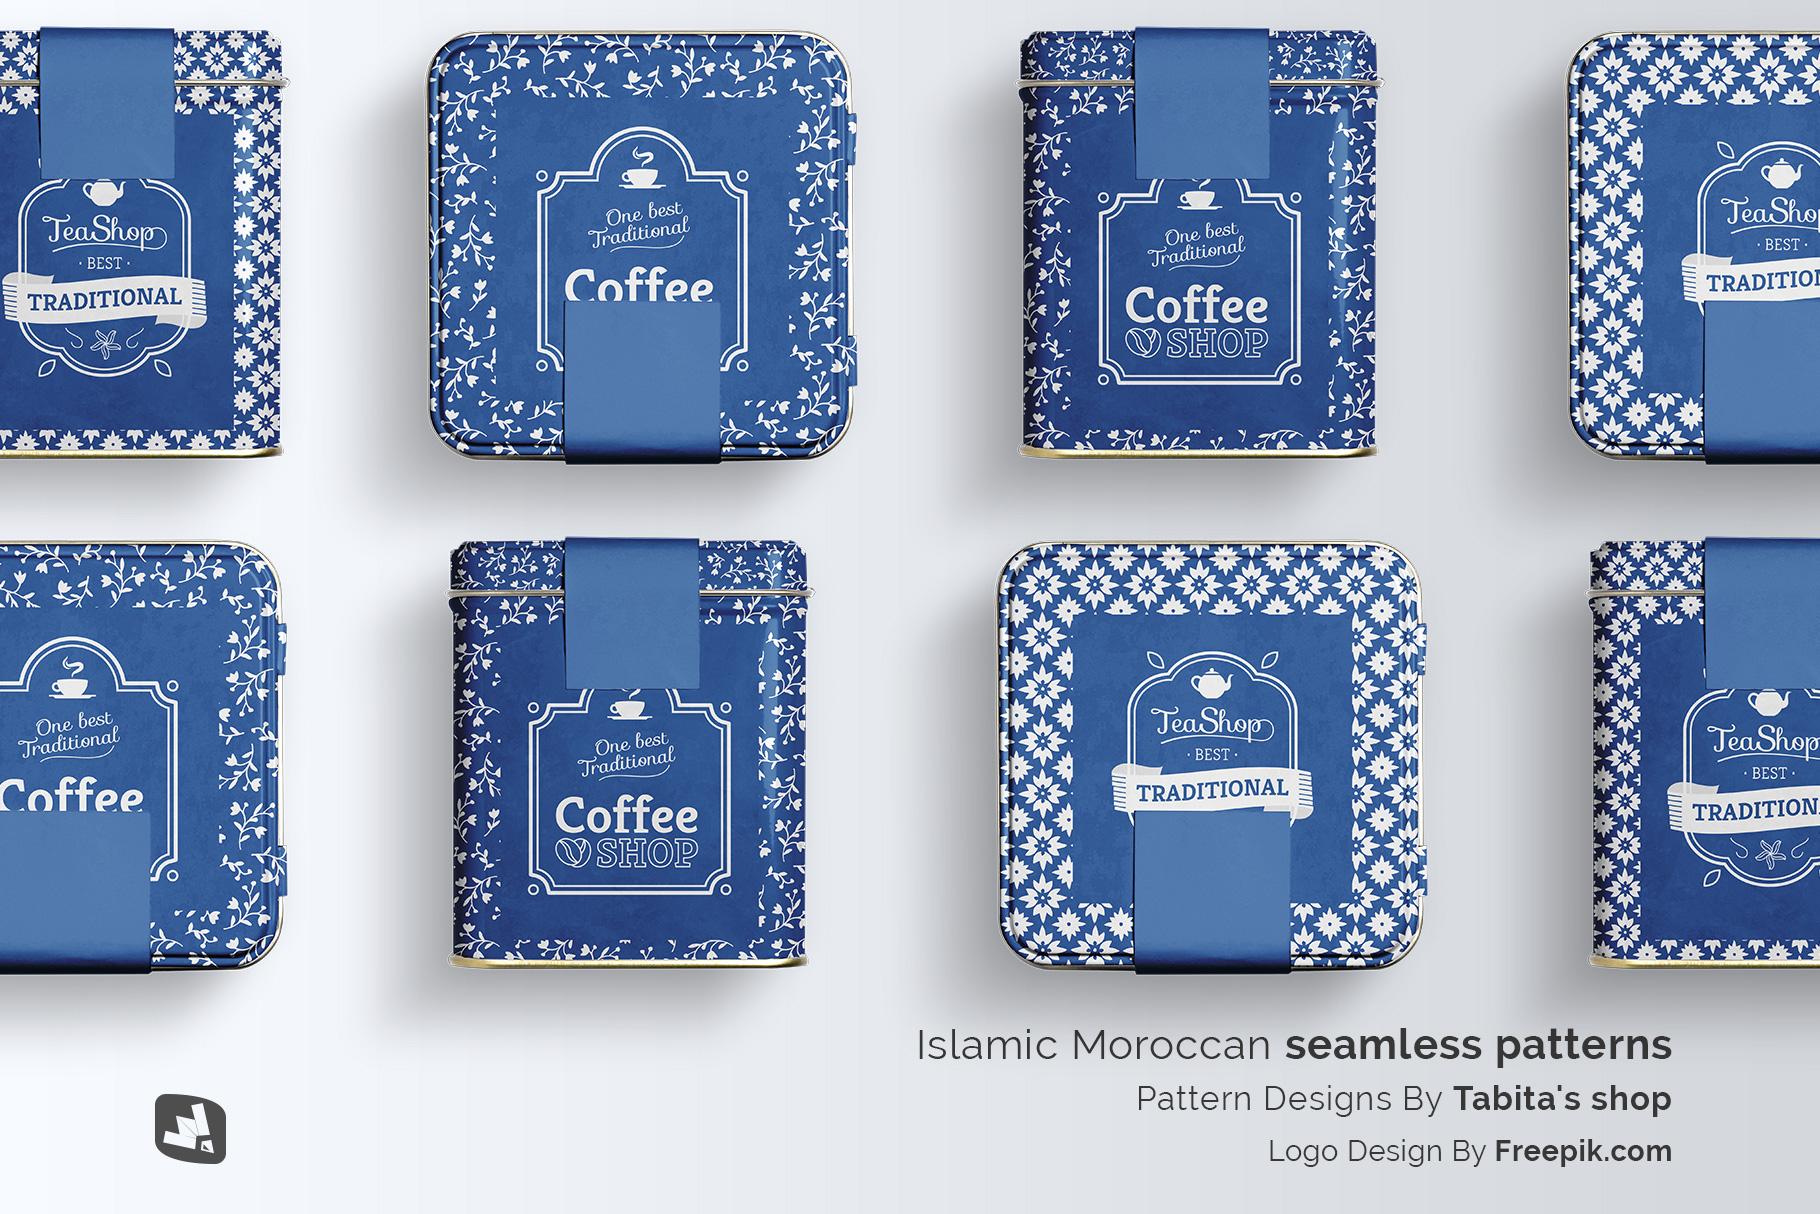 designer's credit of the organic tea tin box packaging mockup